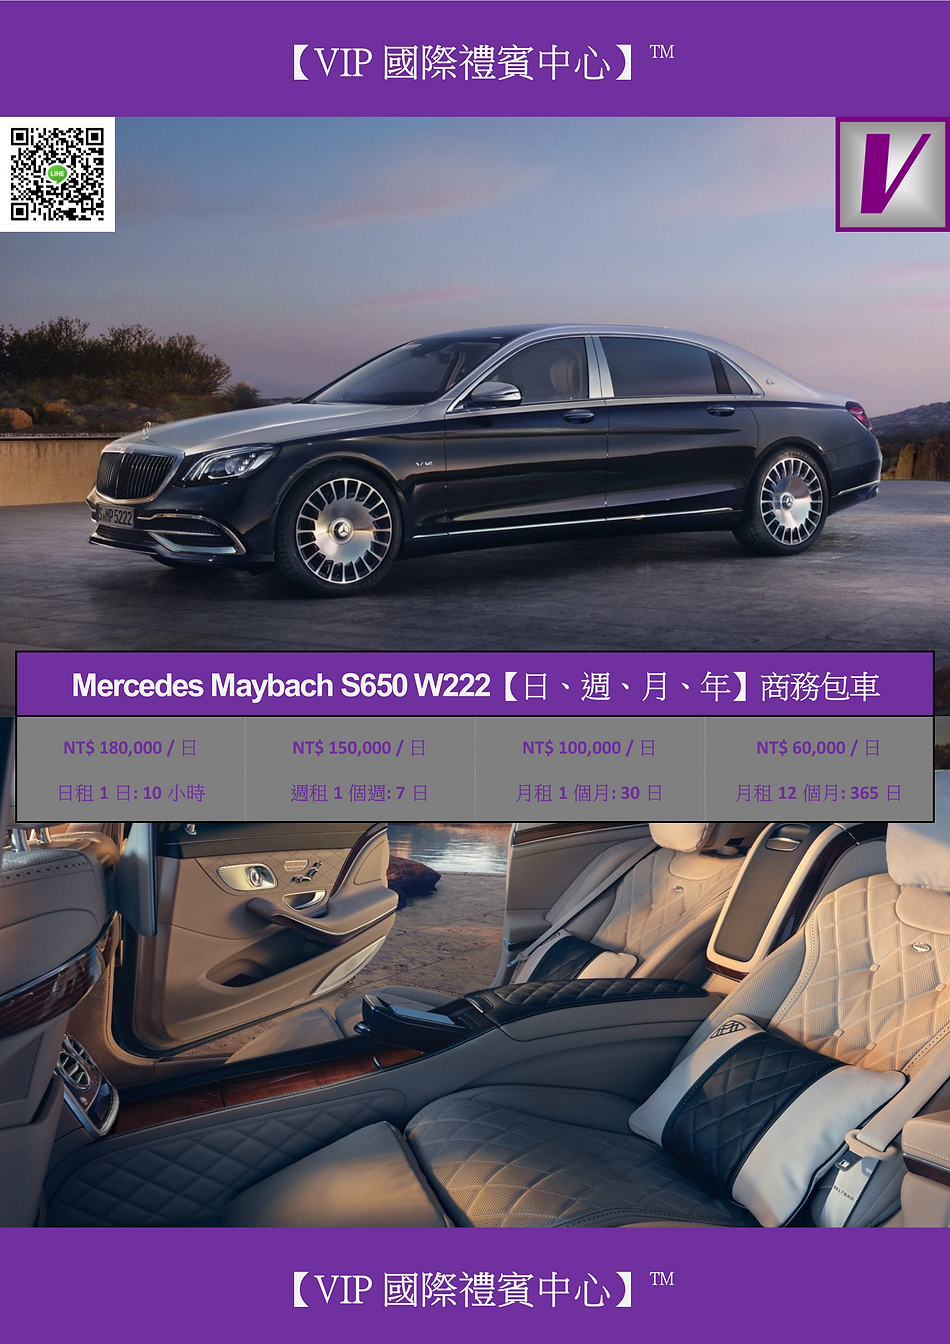 VIP國際禮賓中心 MERCEDES MAYBACH S650 W222 DM.